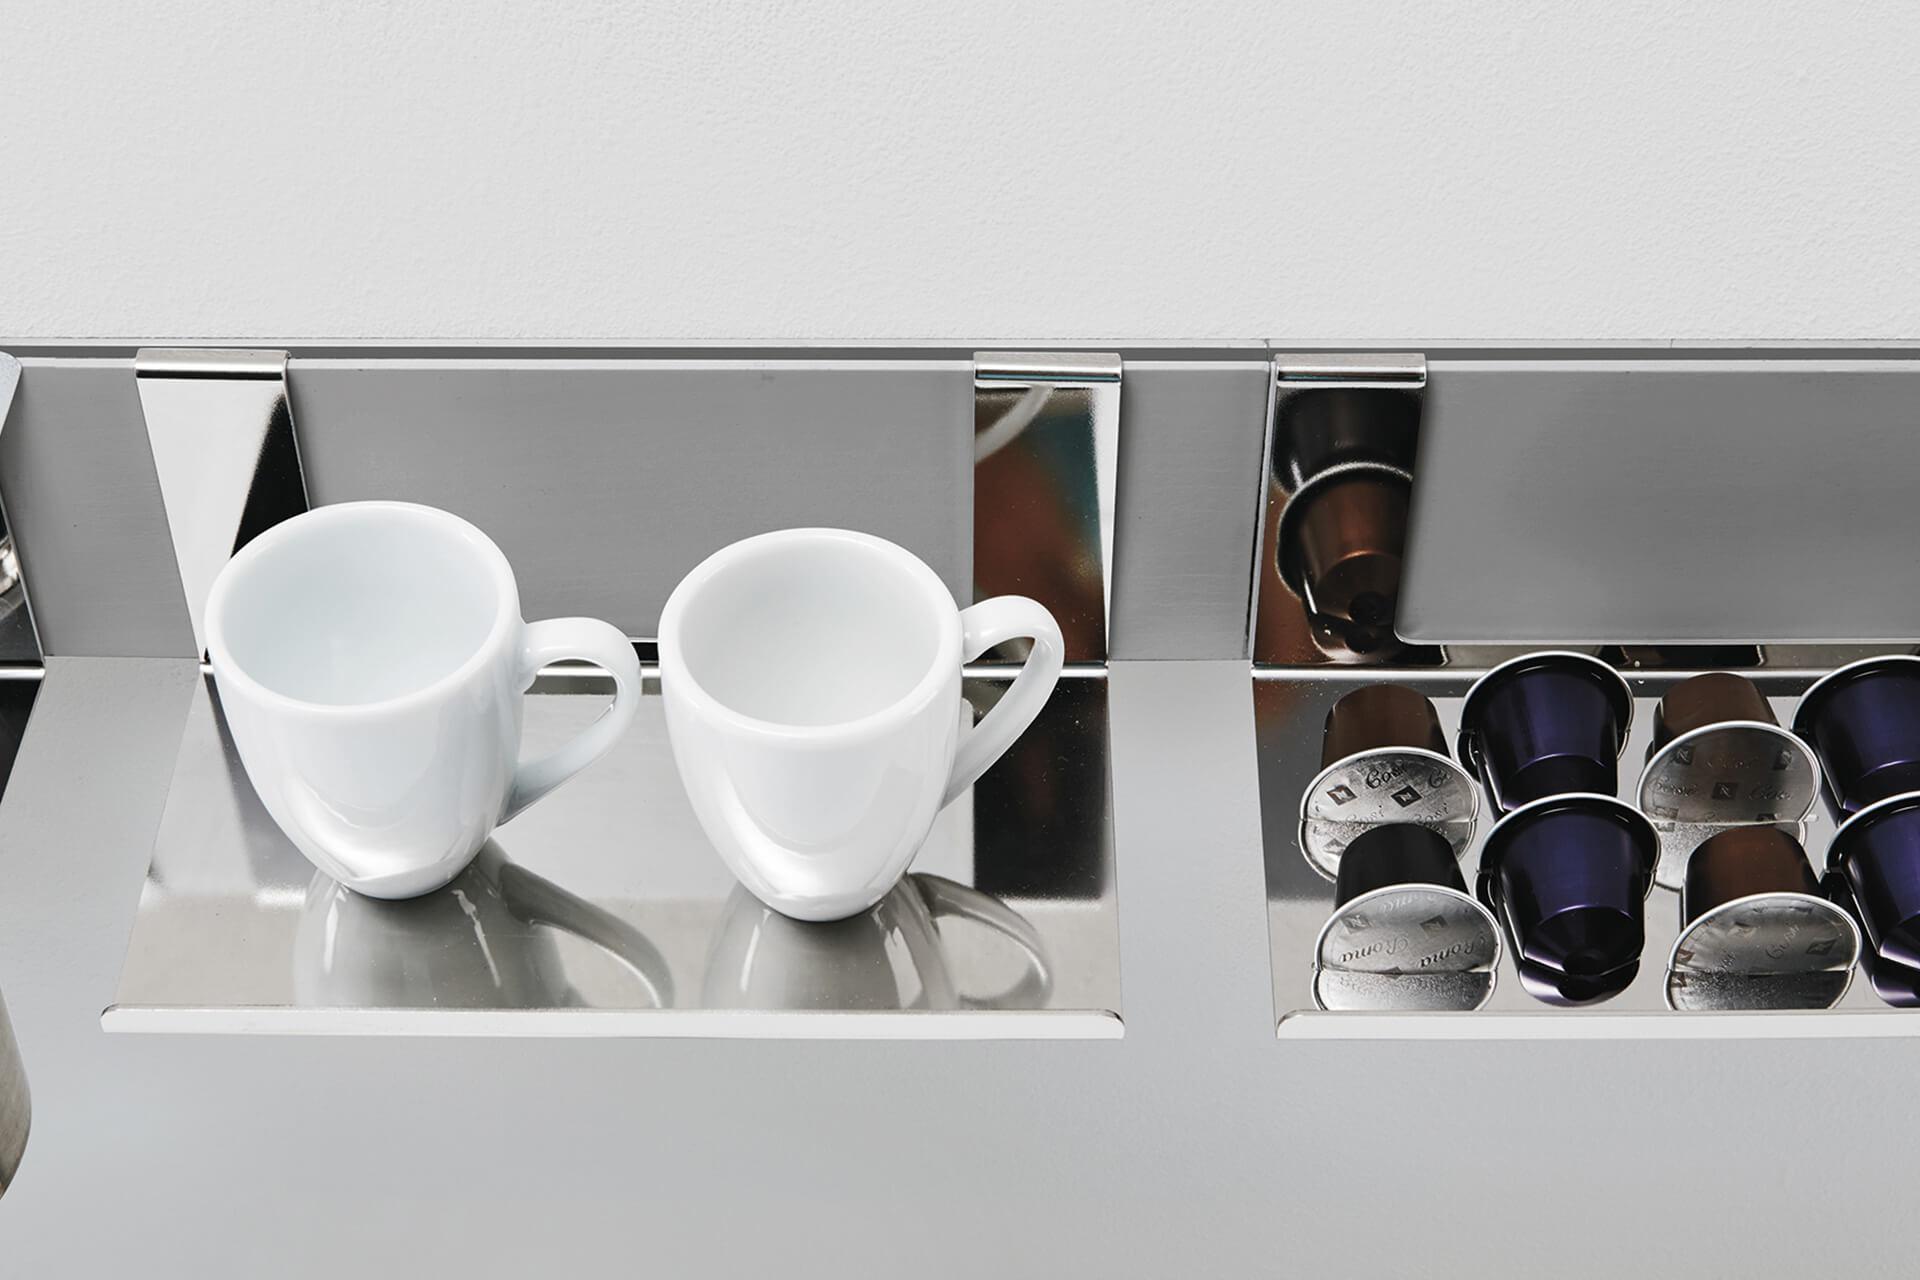 Stunning Accessori Design Cucina Gallery - augers.us - augers.us